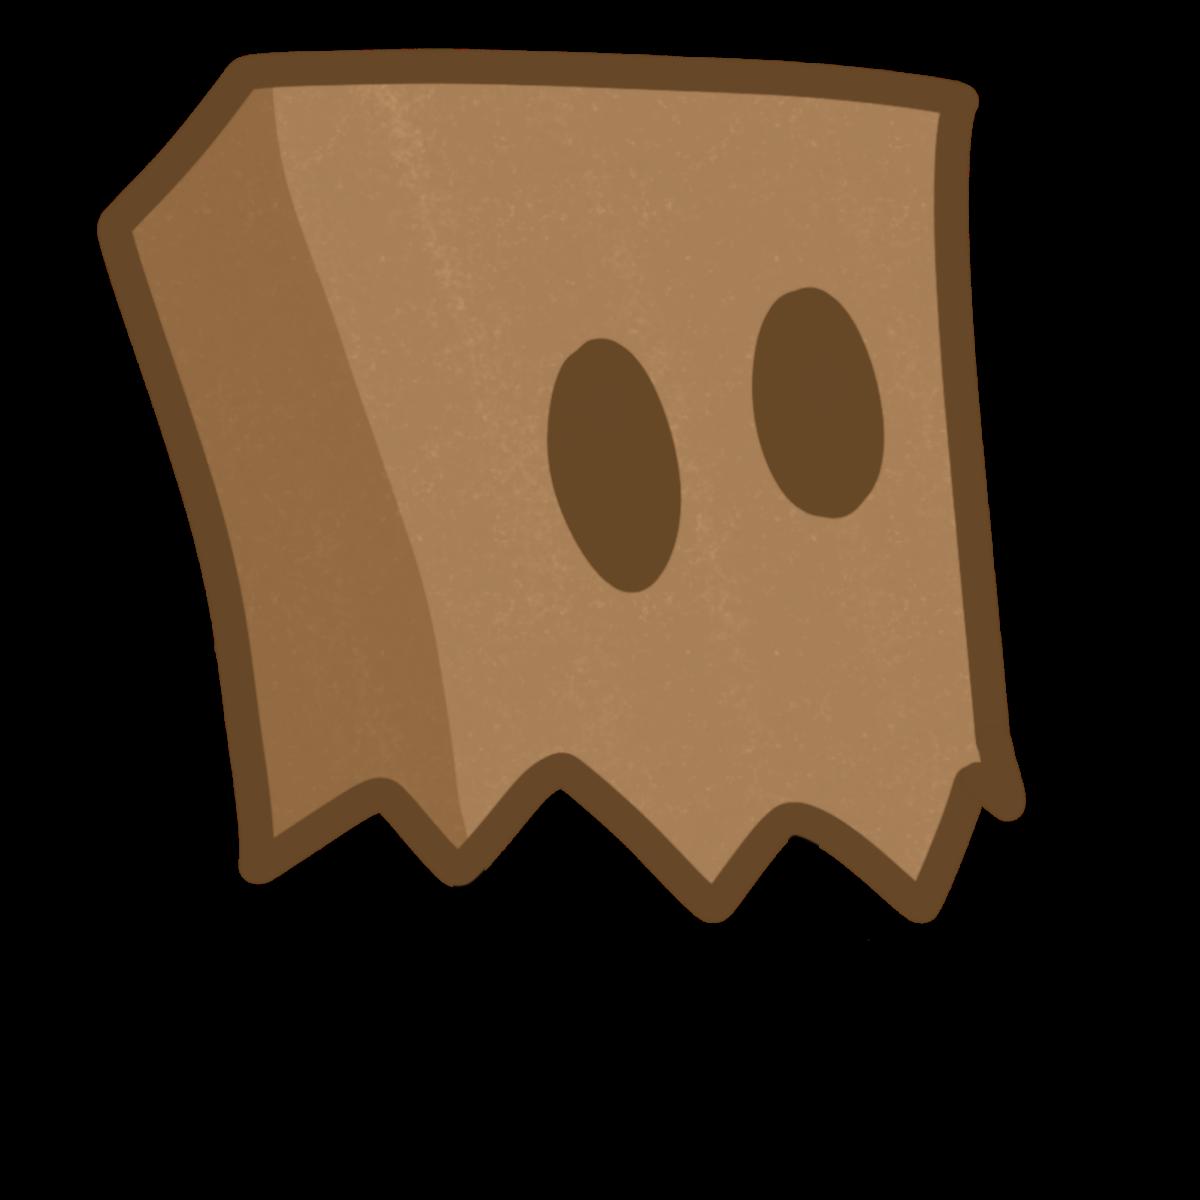 Bag (Object Object)